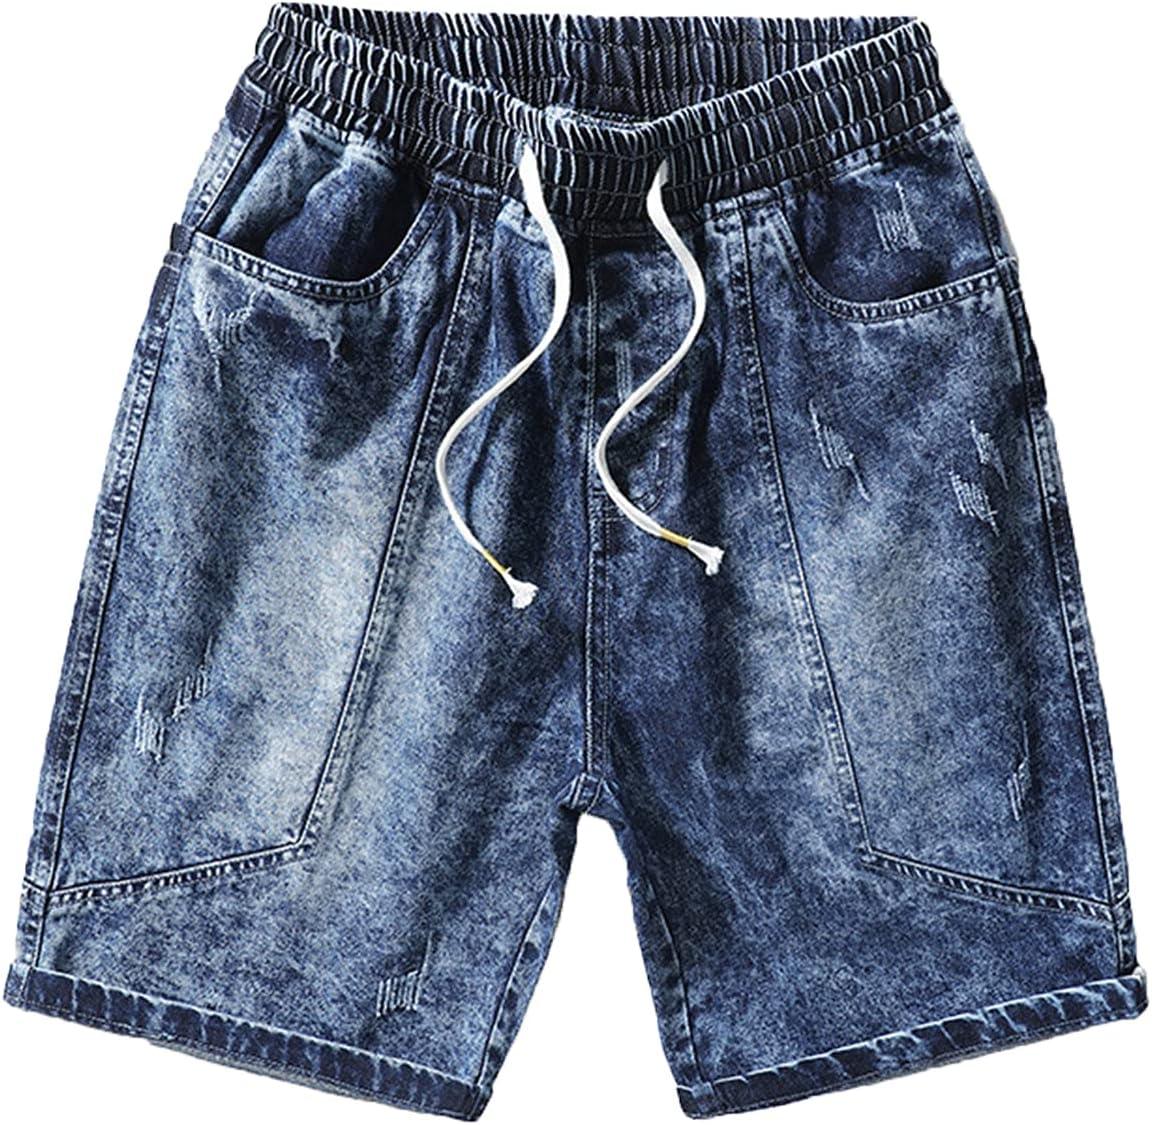 Men's Loose Denim Shorts Ummer Plus Size Casual Jeans Shorts Classic Fit Drawstring Elastic Waist Jean Short Pants (Blue,Large)